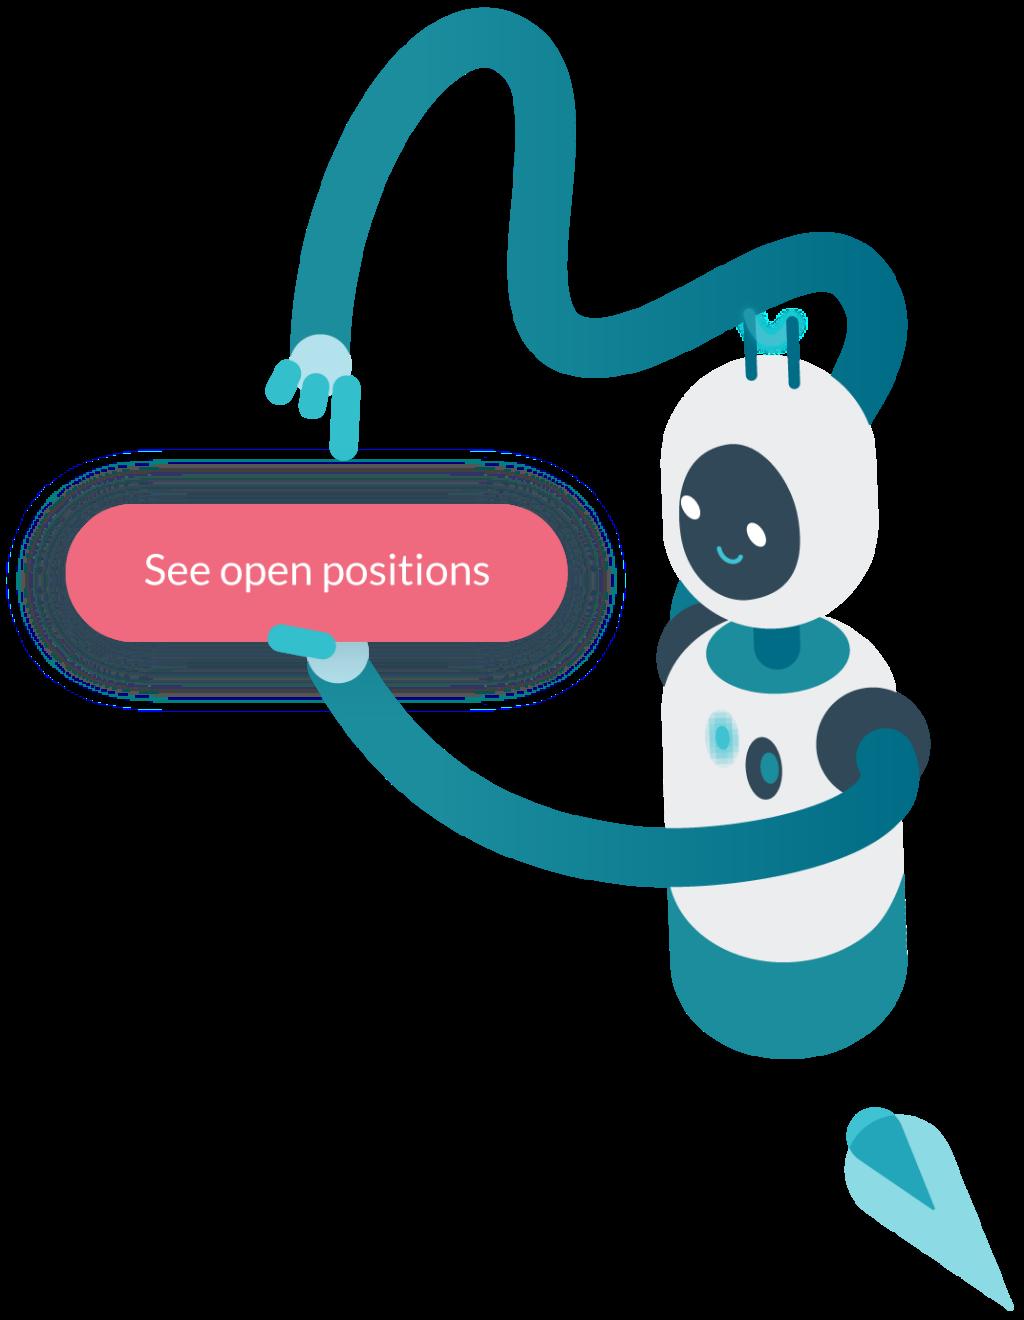 Minim robot - see open positions